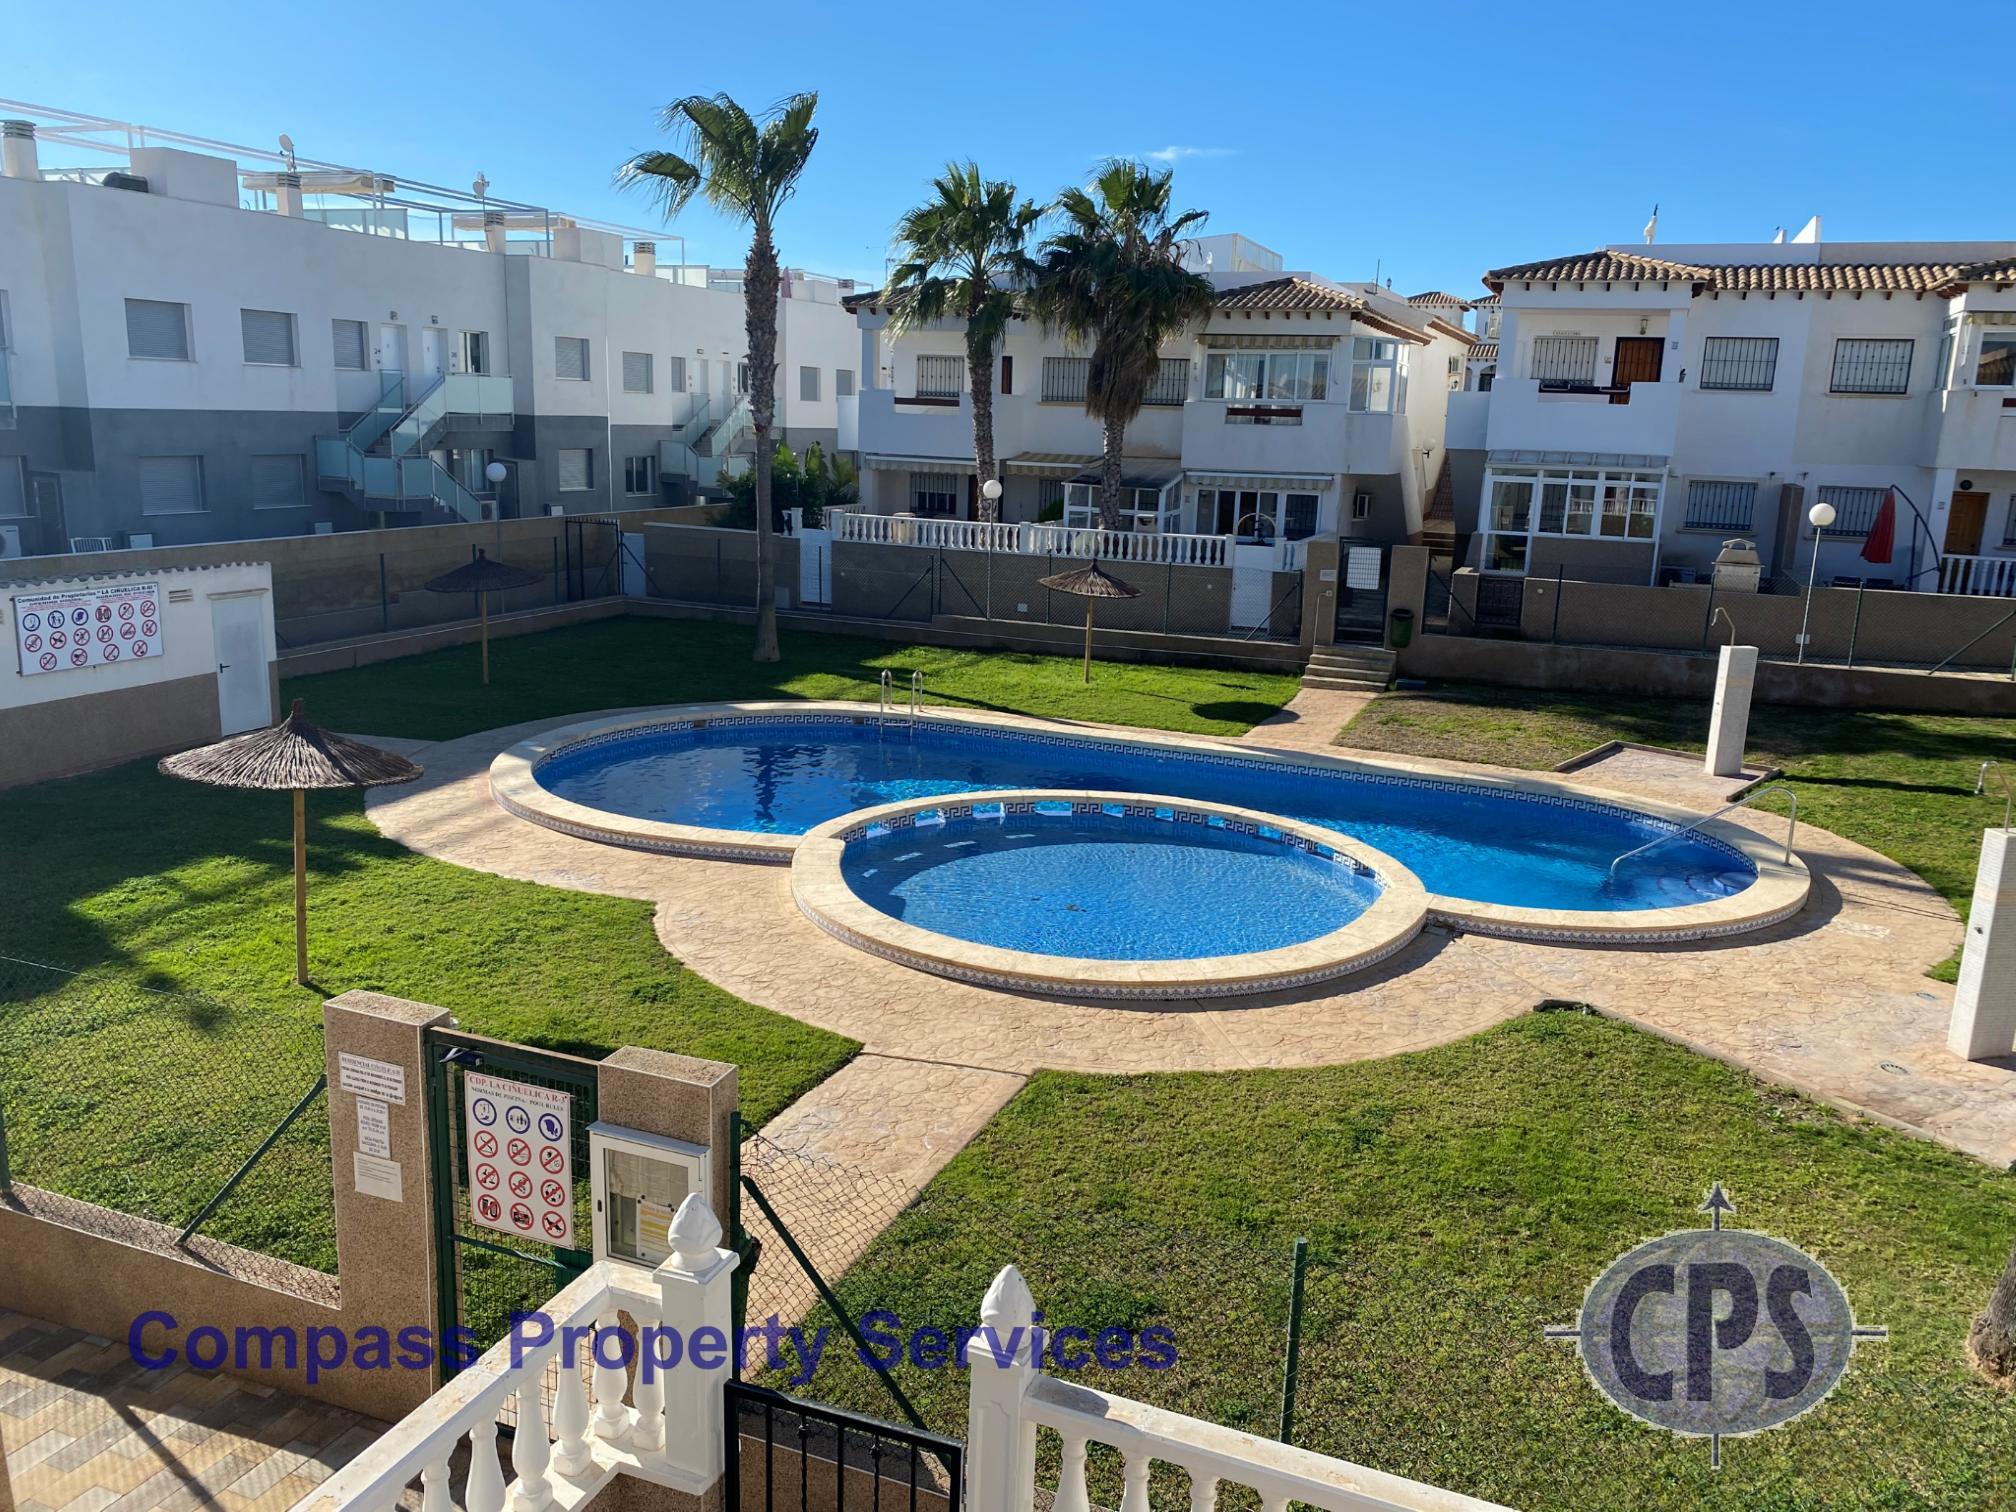 La Cinuelica R3 1st flr apt overlooking pool l149 photo 28556761